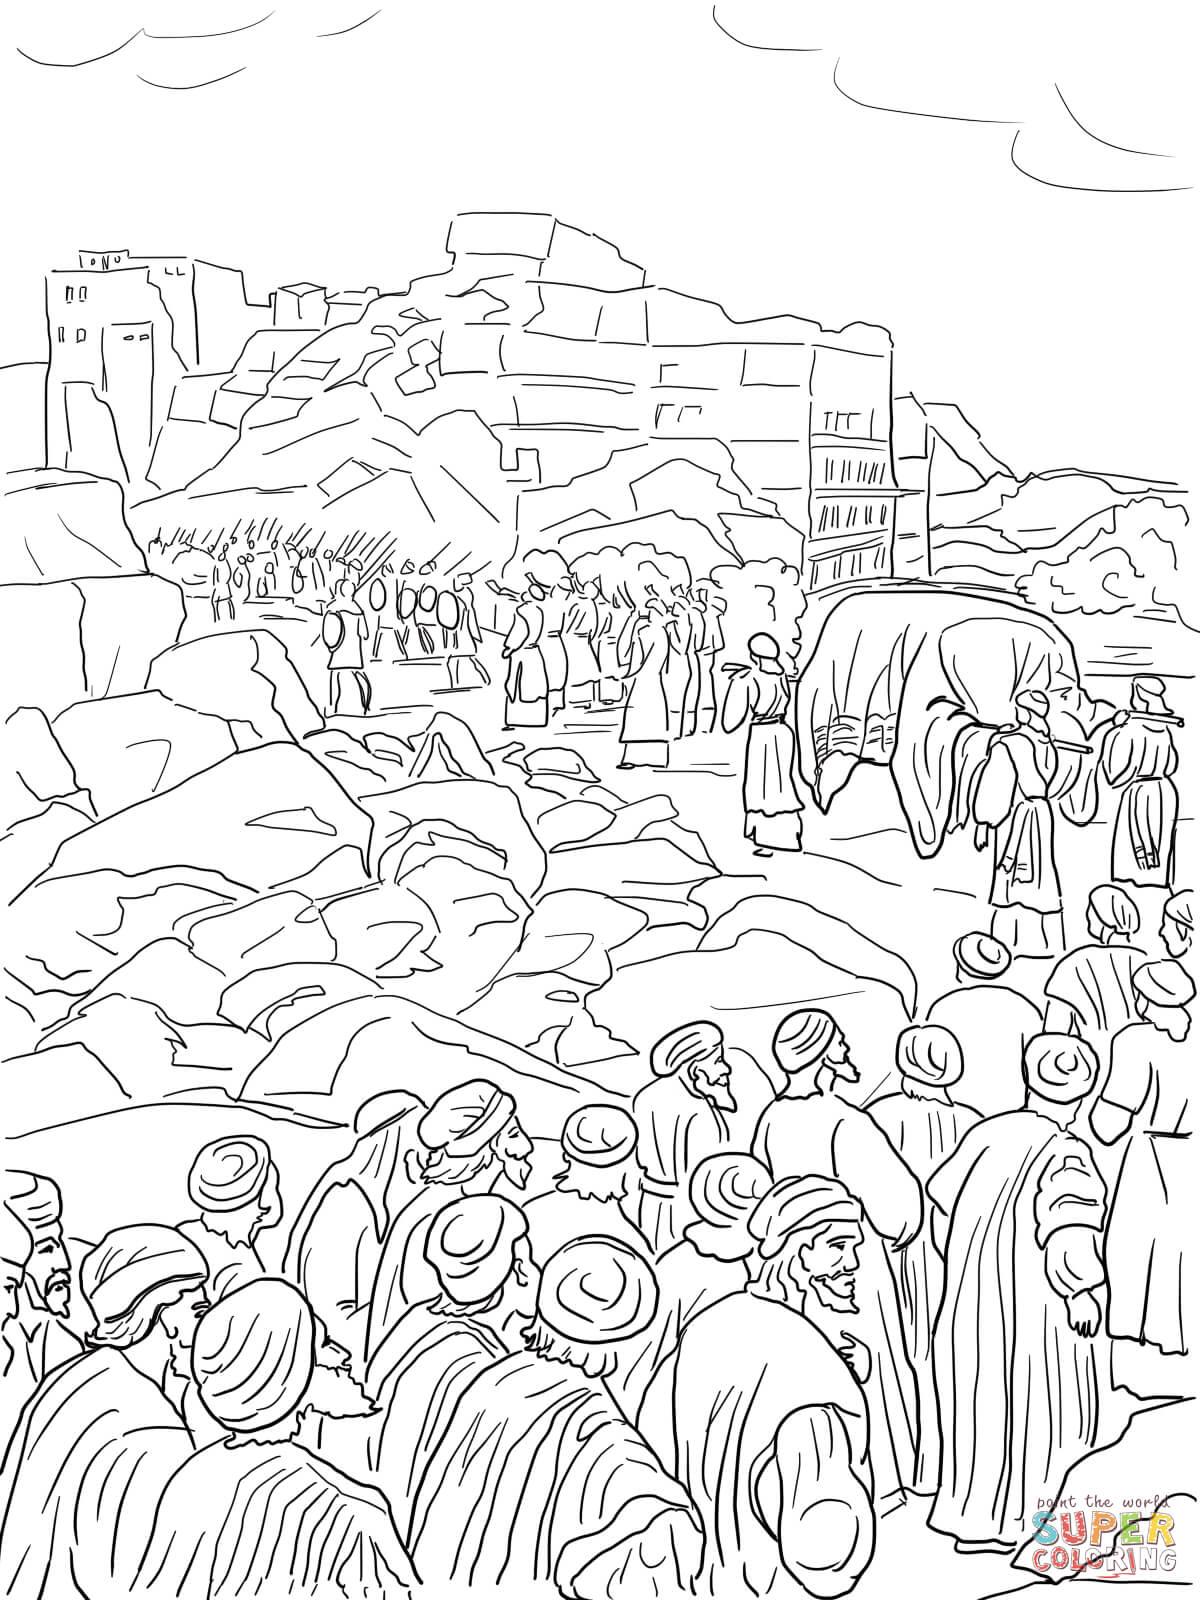 Capture coloring #11, Download drawings